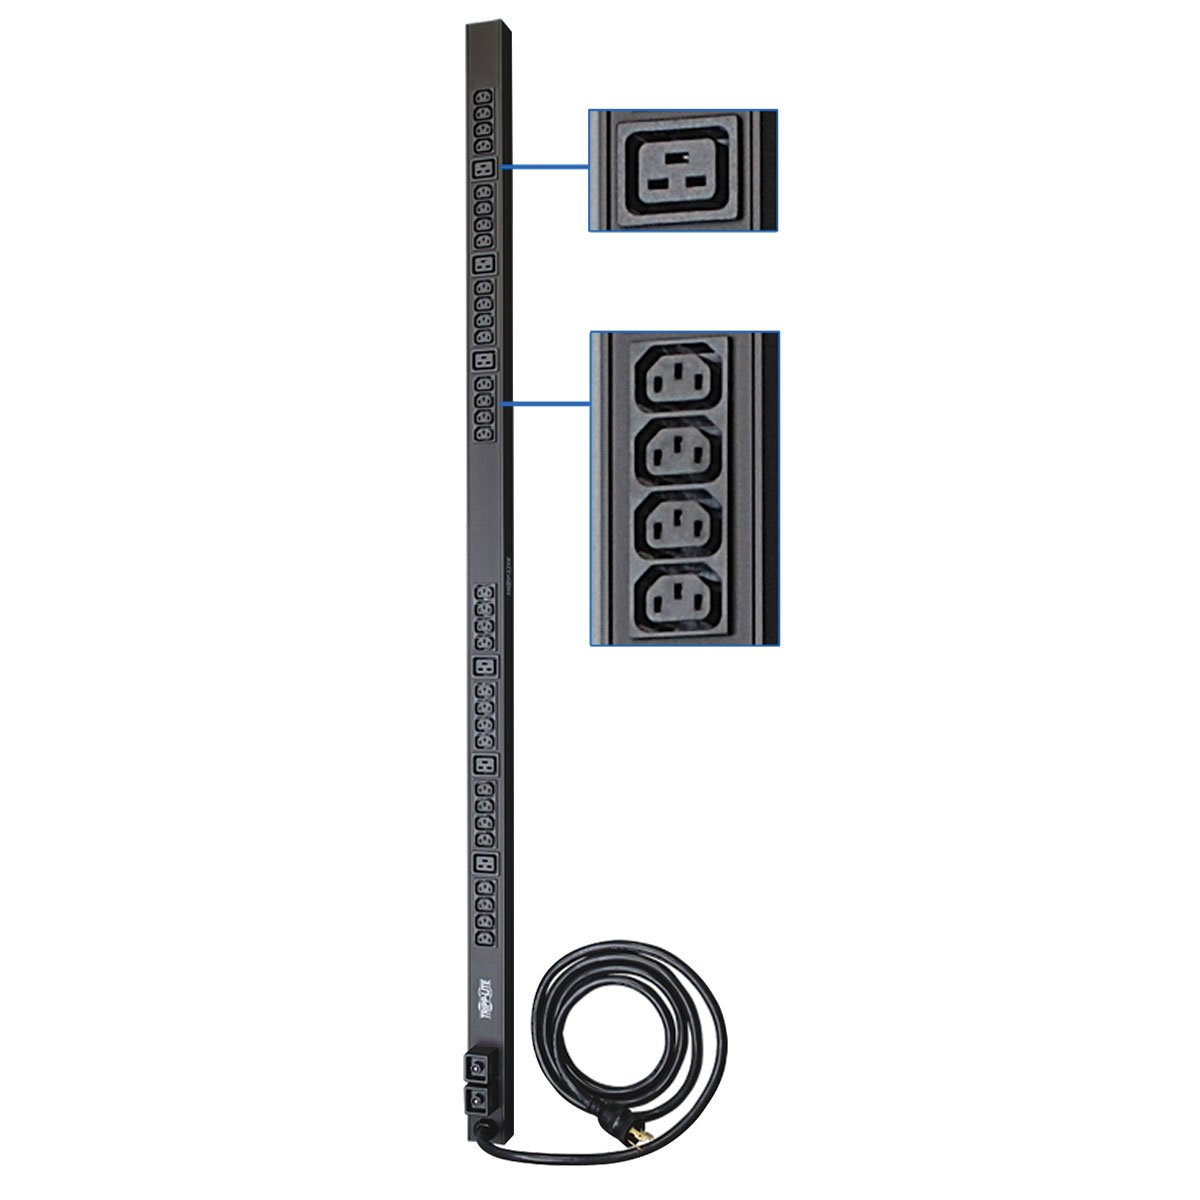 Tripp Lite Pduv30hv Basic Pdu Vertical Rack Mount Power